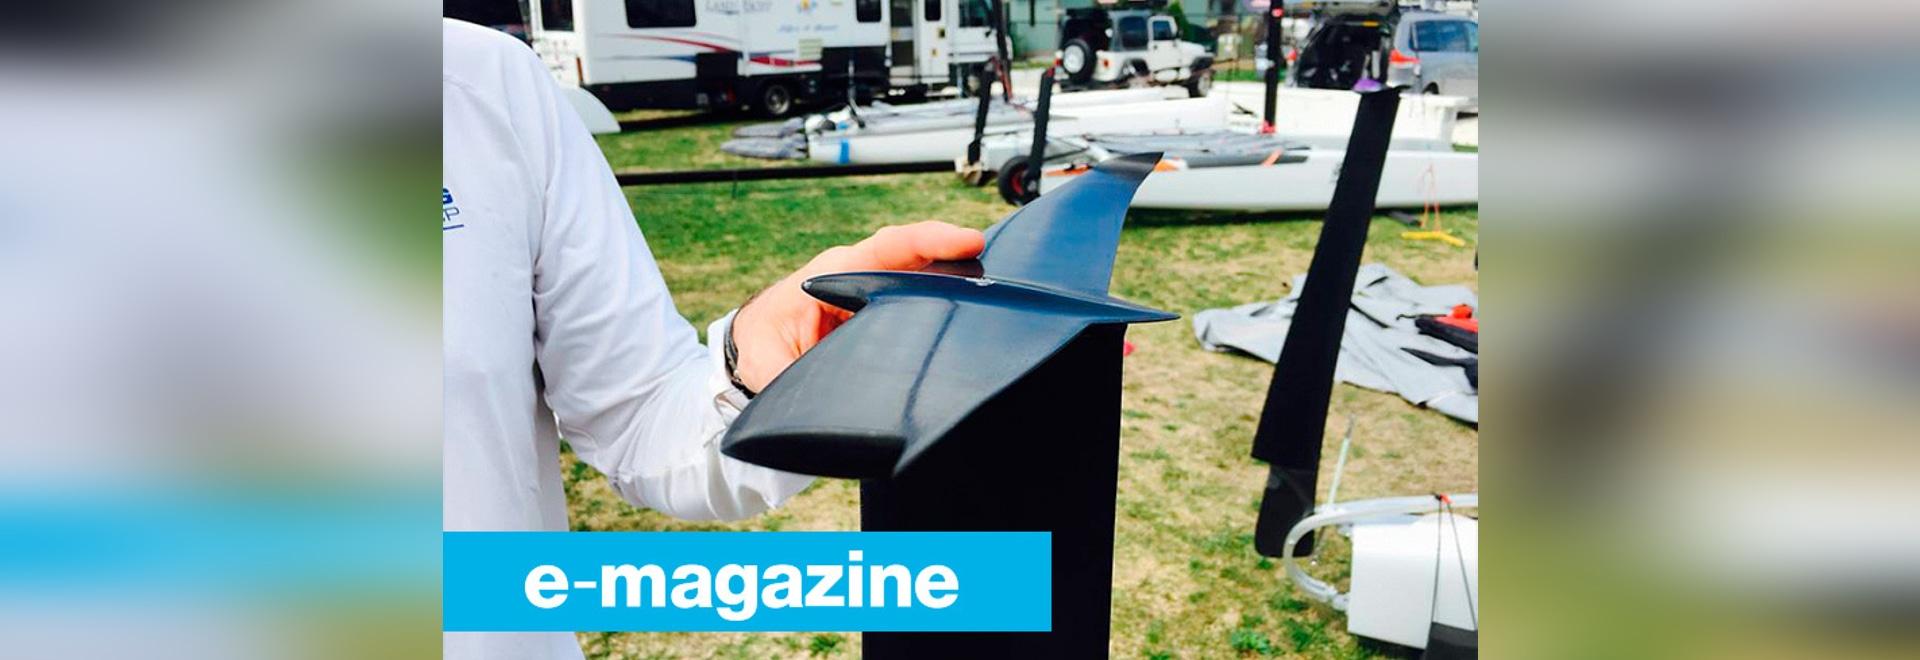 Hydrofoils' Main Pros and Cons